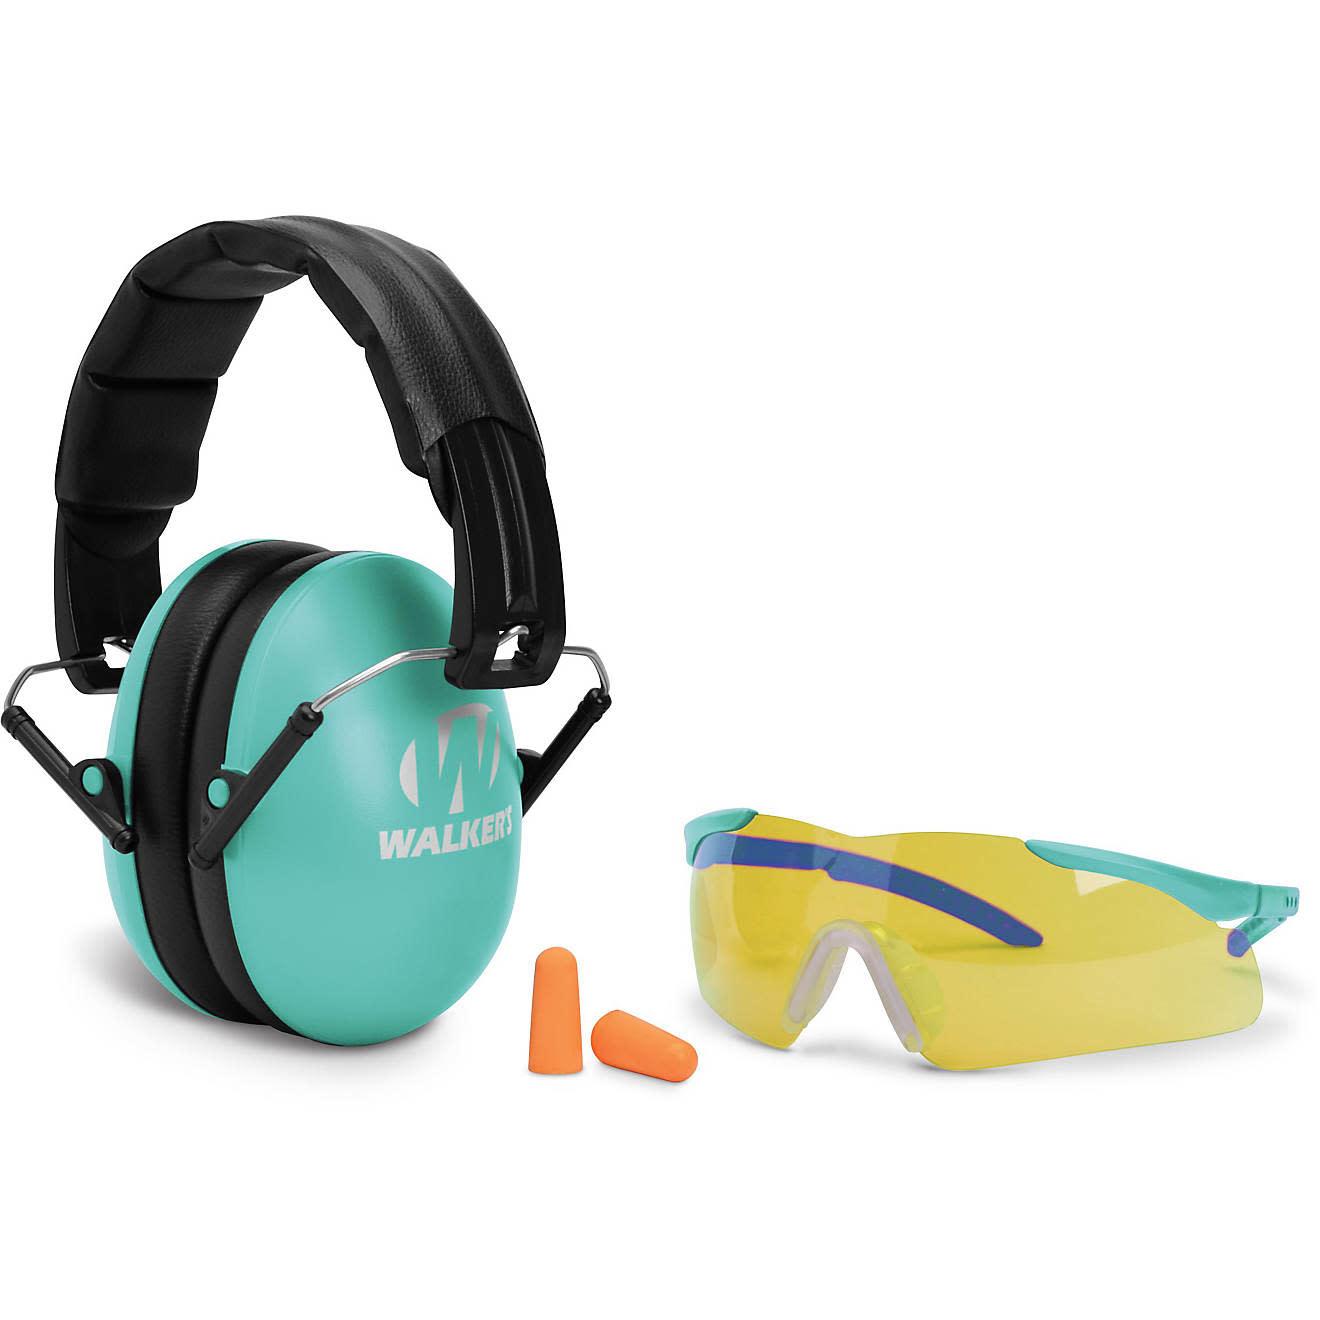 Walker's Walkers Youth and Women Combo Kit, Folding Muff, Sport Glasses, Foam Tips, Teal